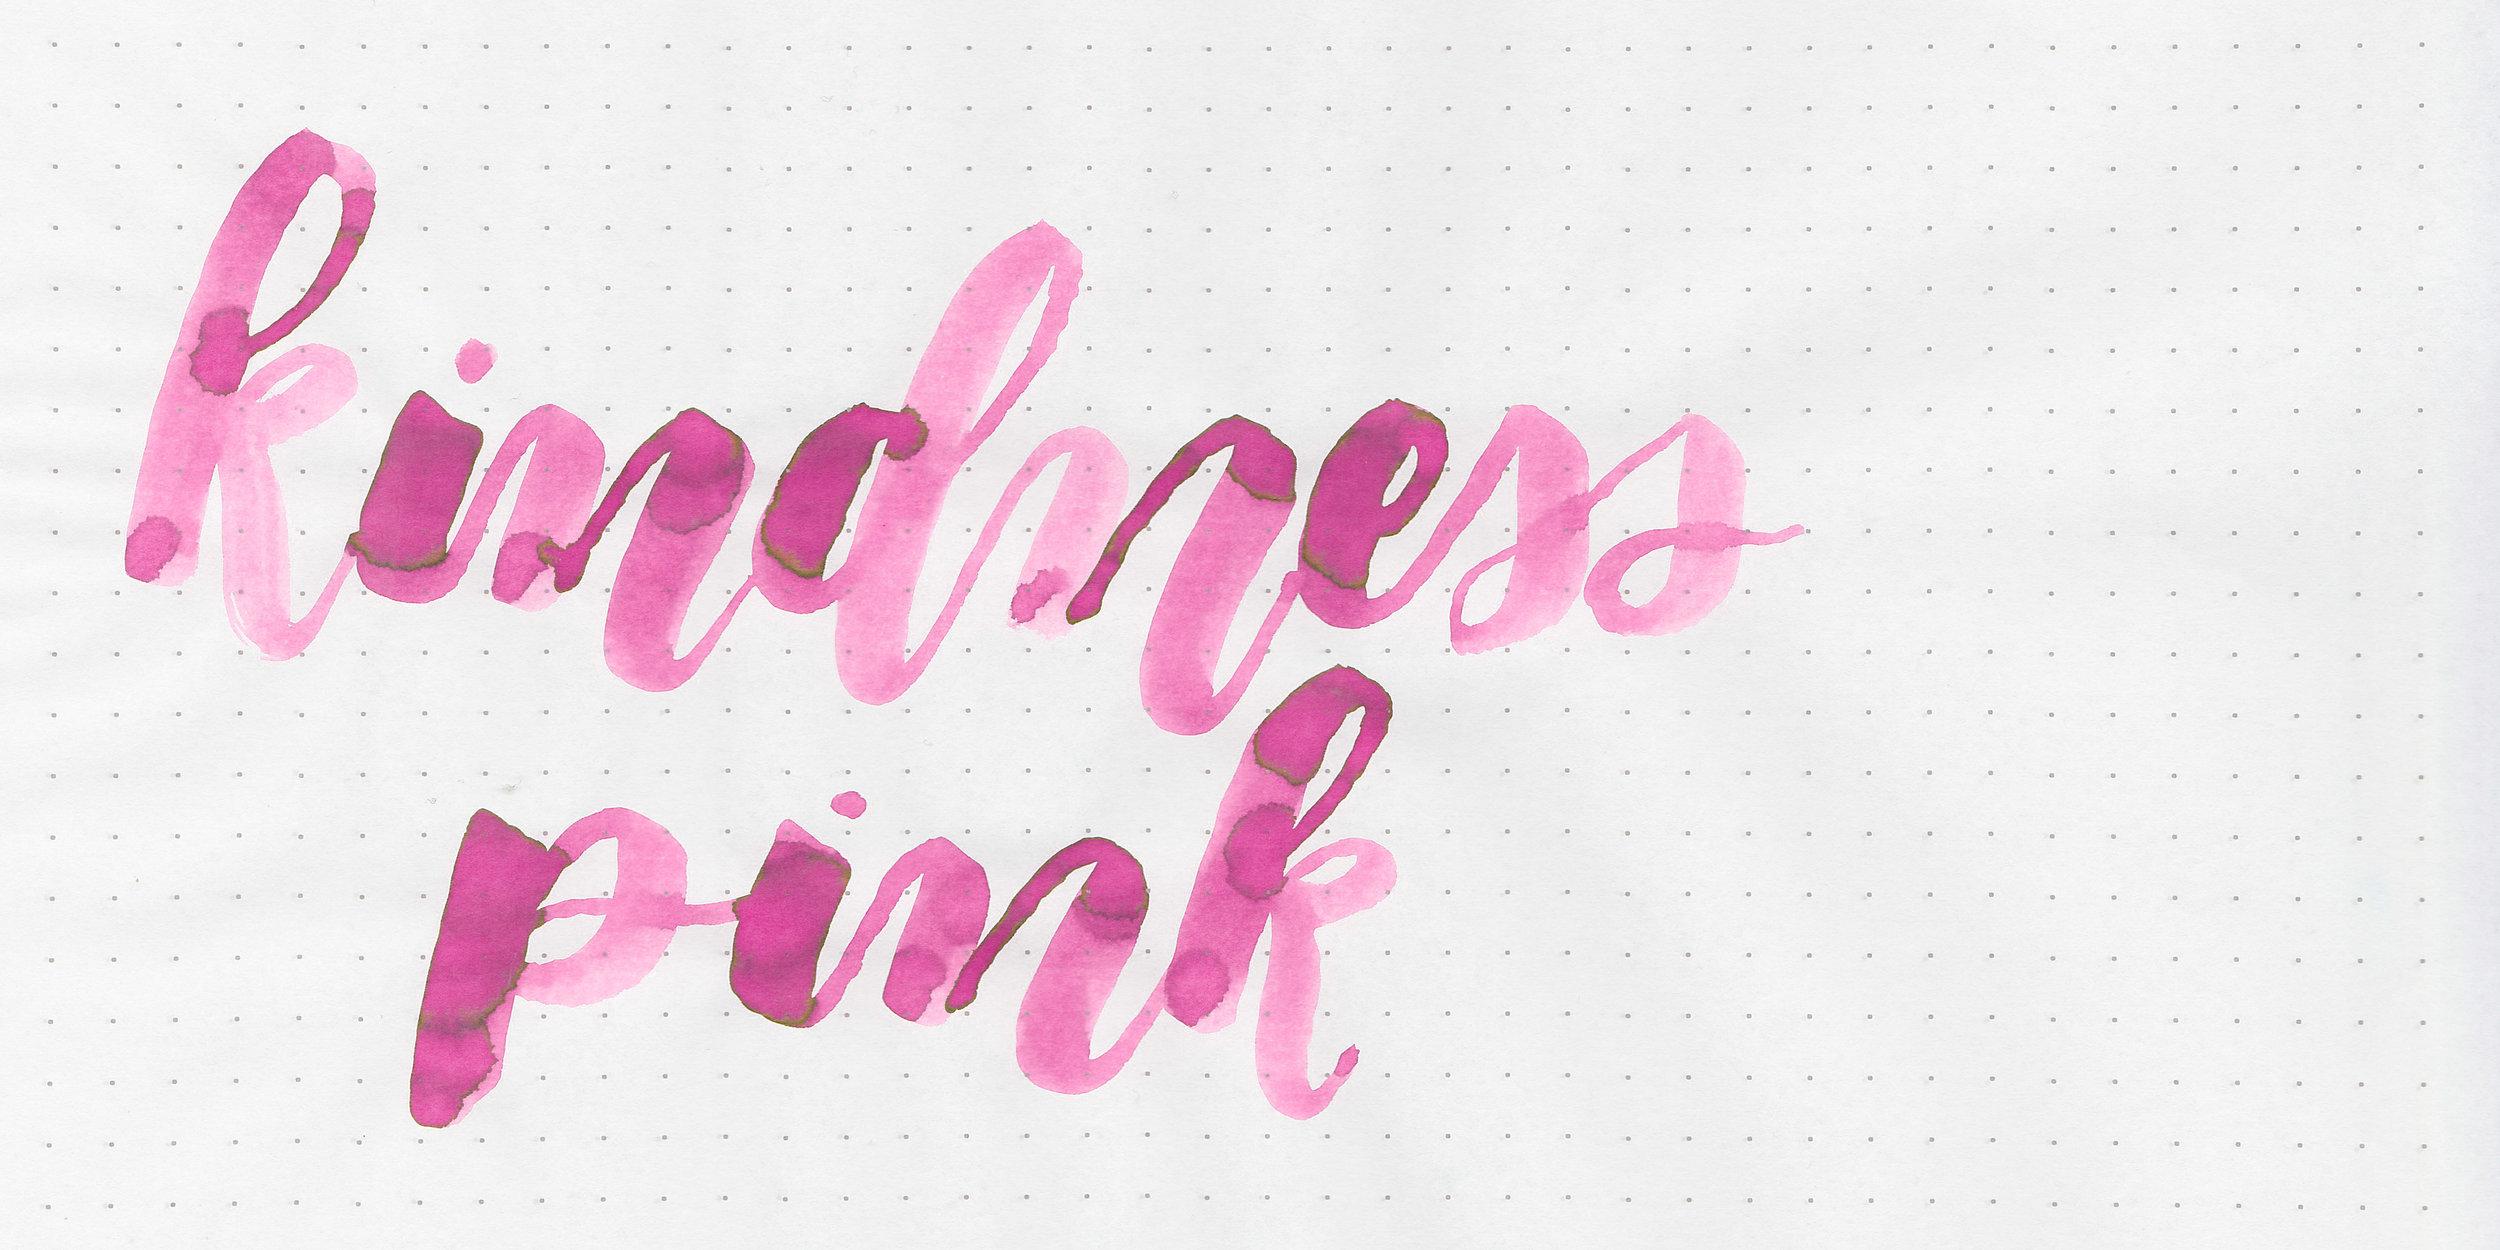 mv-kindness-2.jpg